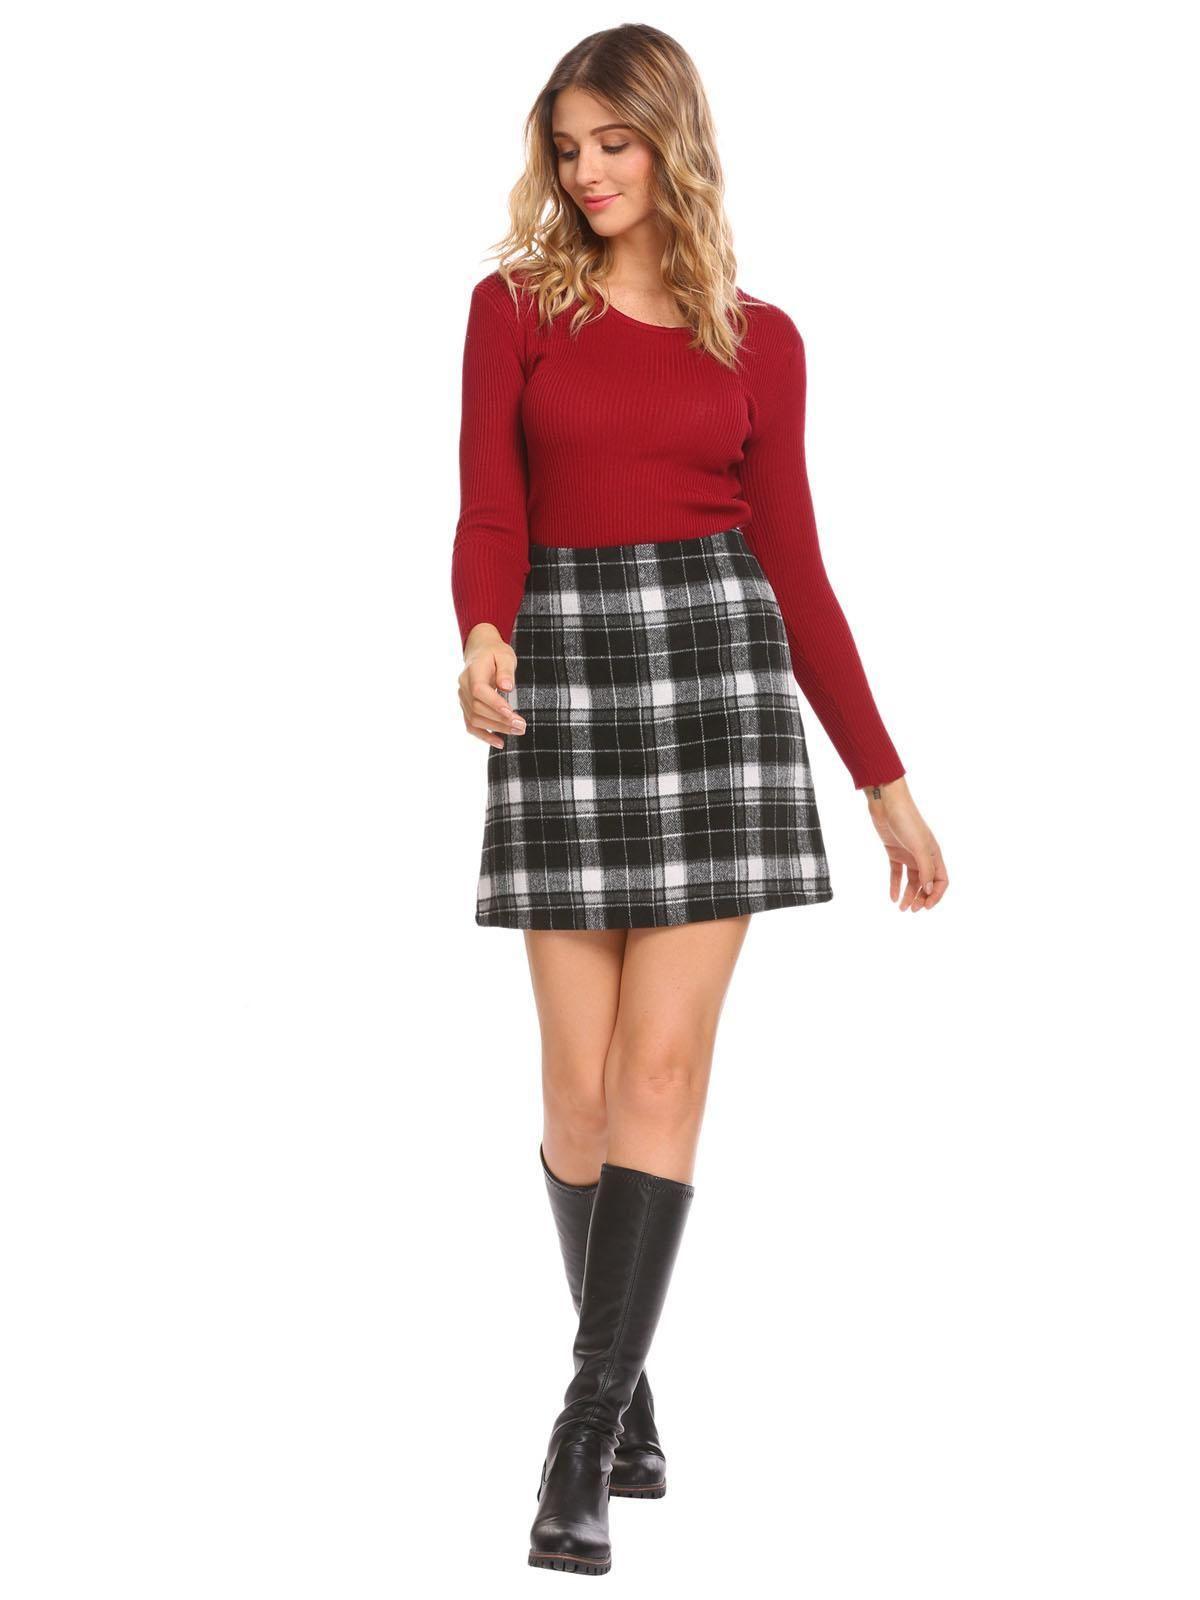 23d712c5d4 Black white A Skirt Waist. Retro Style Red Short Sleeve Collared Button Up  Blouse – Unique Vintage